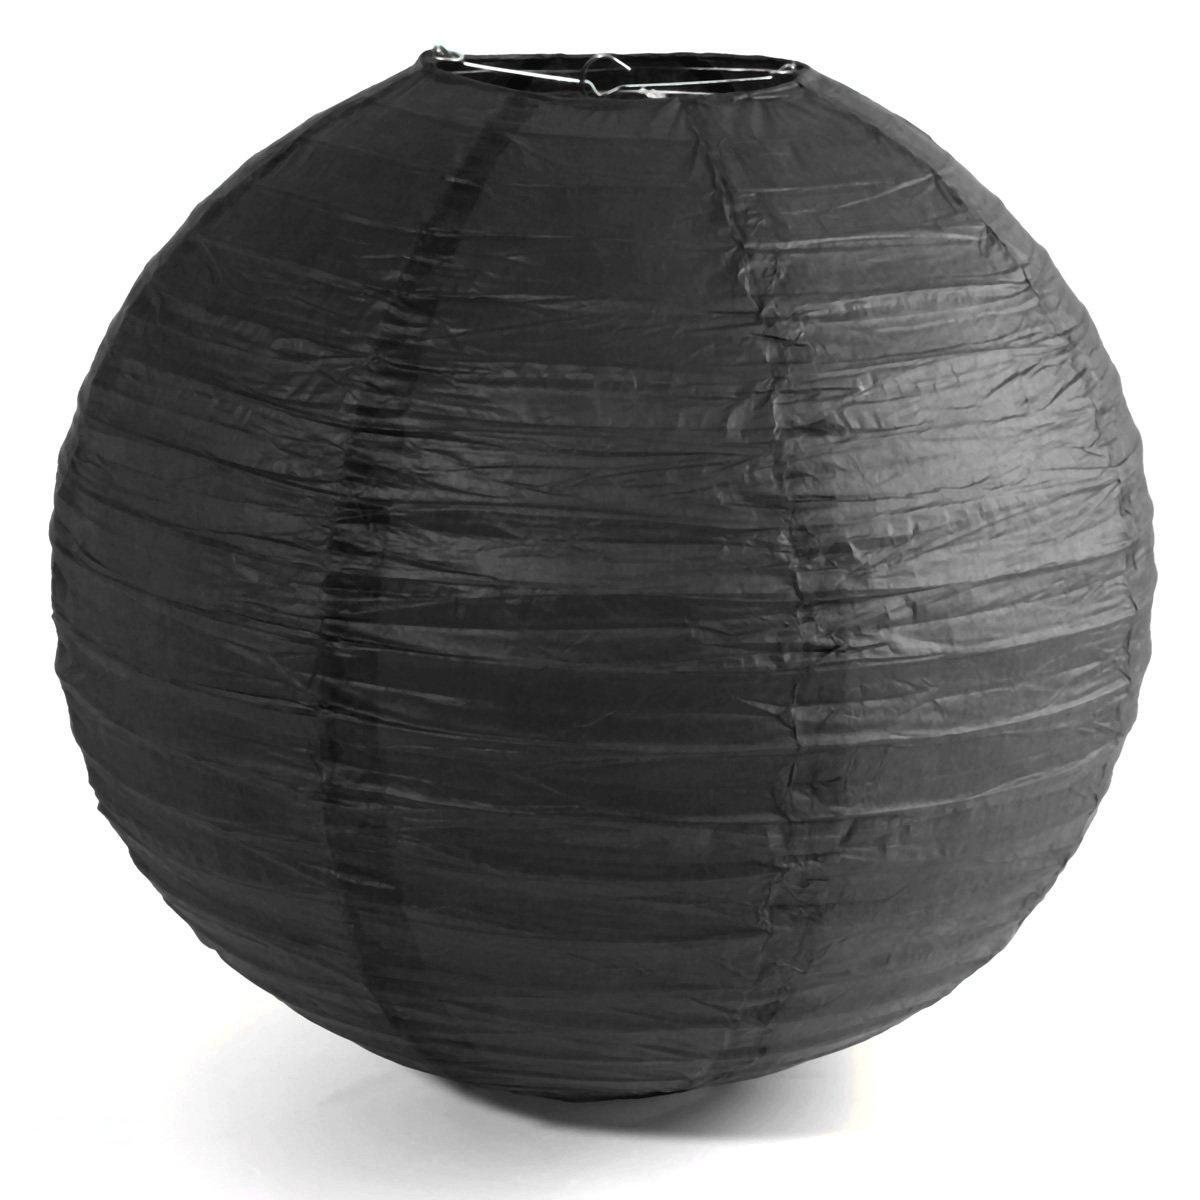 "Paper Lantern - TOOGOO(R)1 x Chinese Japanese Paper Lantern Lampshade for Party Wedding, 50cm(20"") Black"